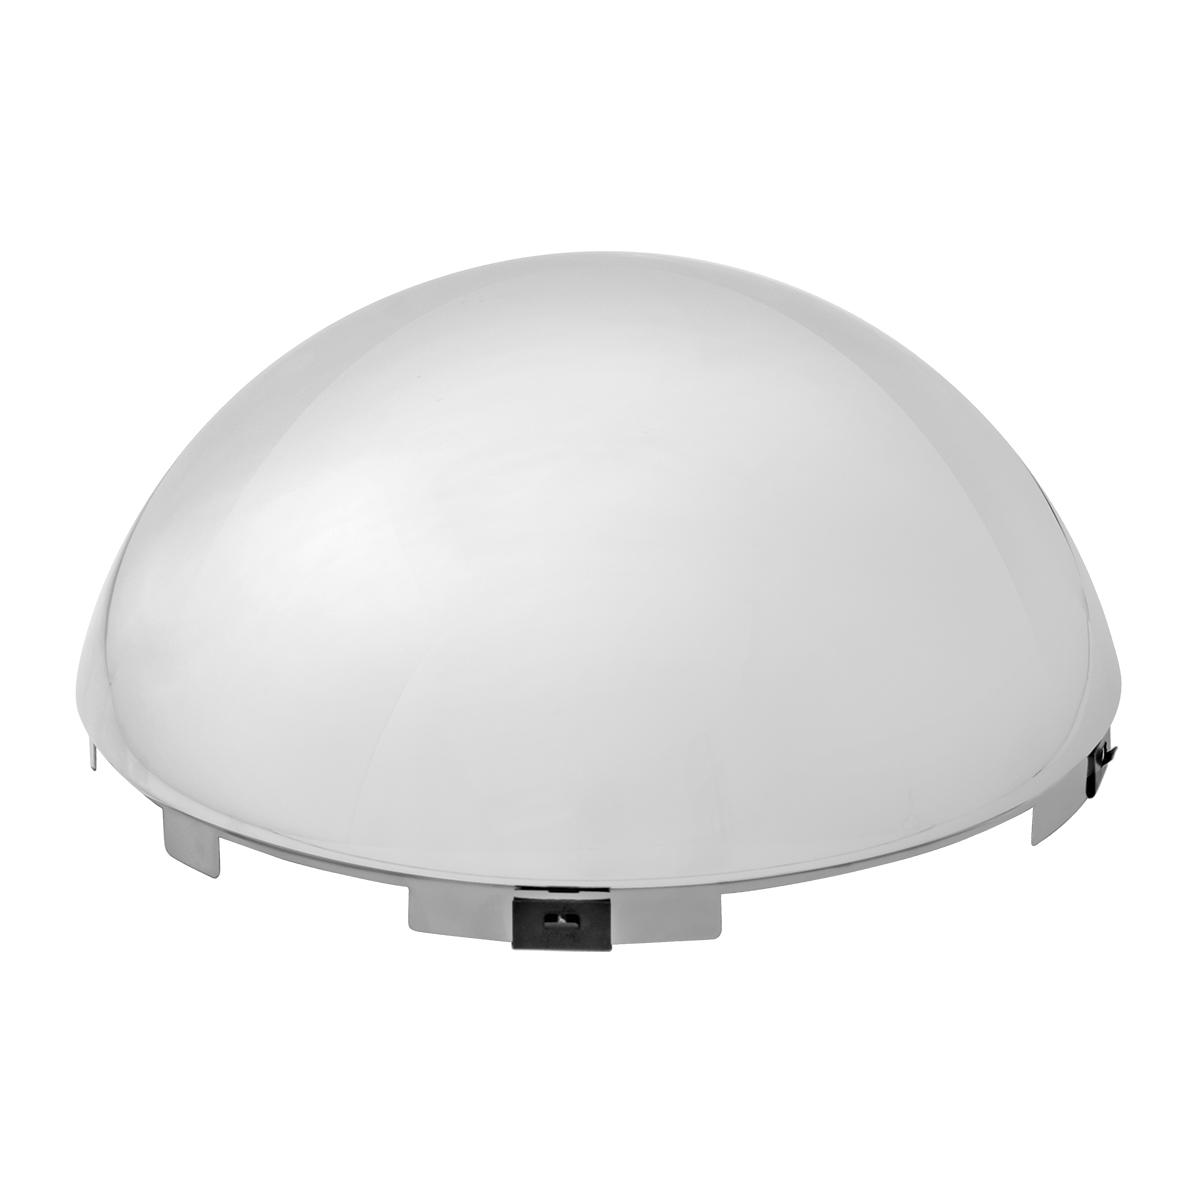 "Full Moon Chrome Front Hub cap - (6 notches/4 clips) 7/16"" Lip - Semi Trucks"